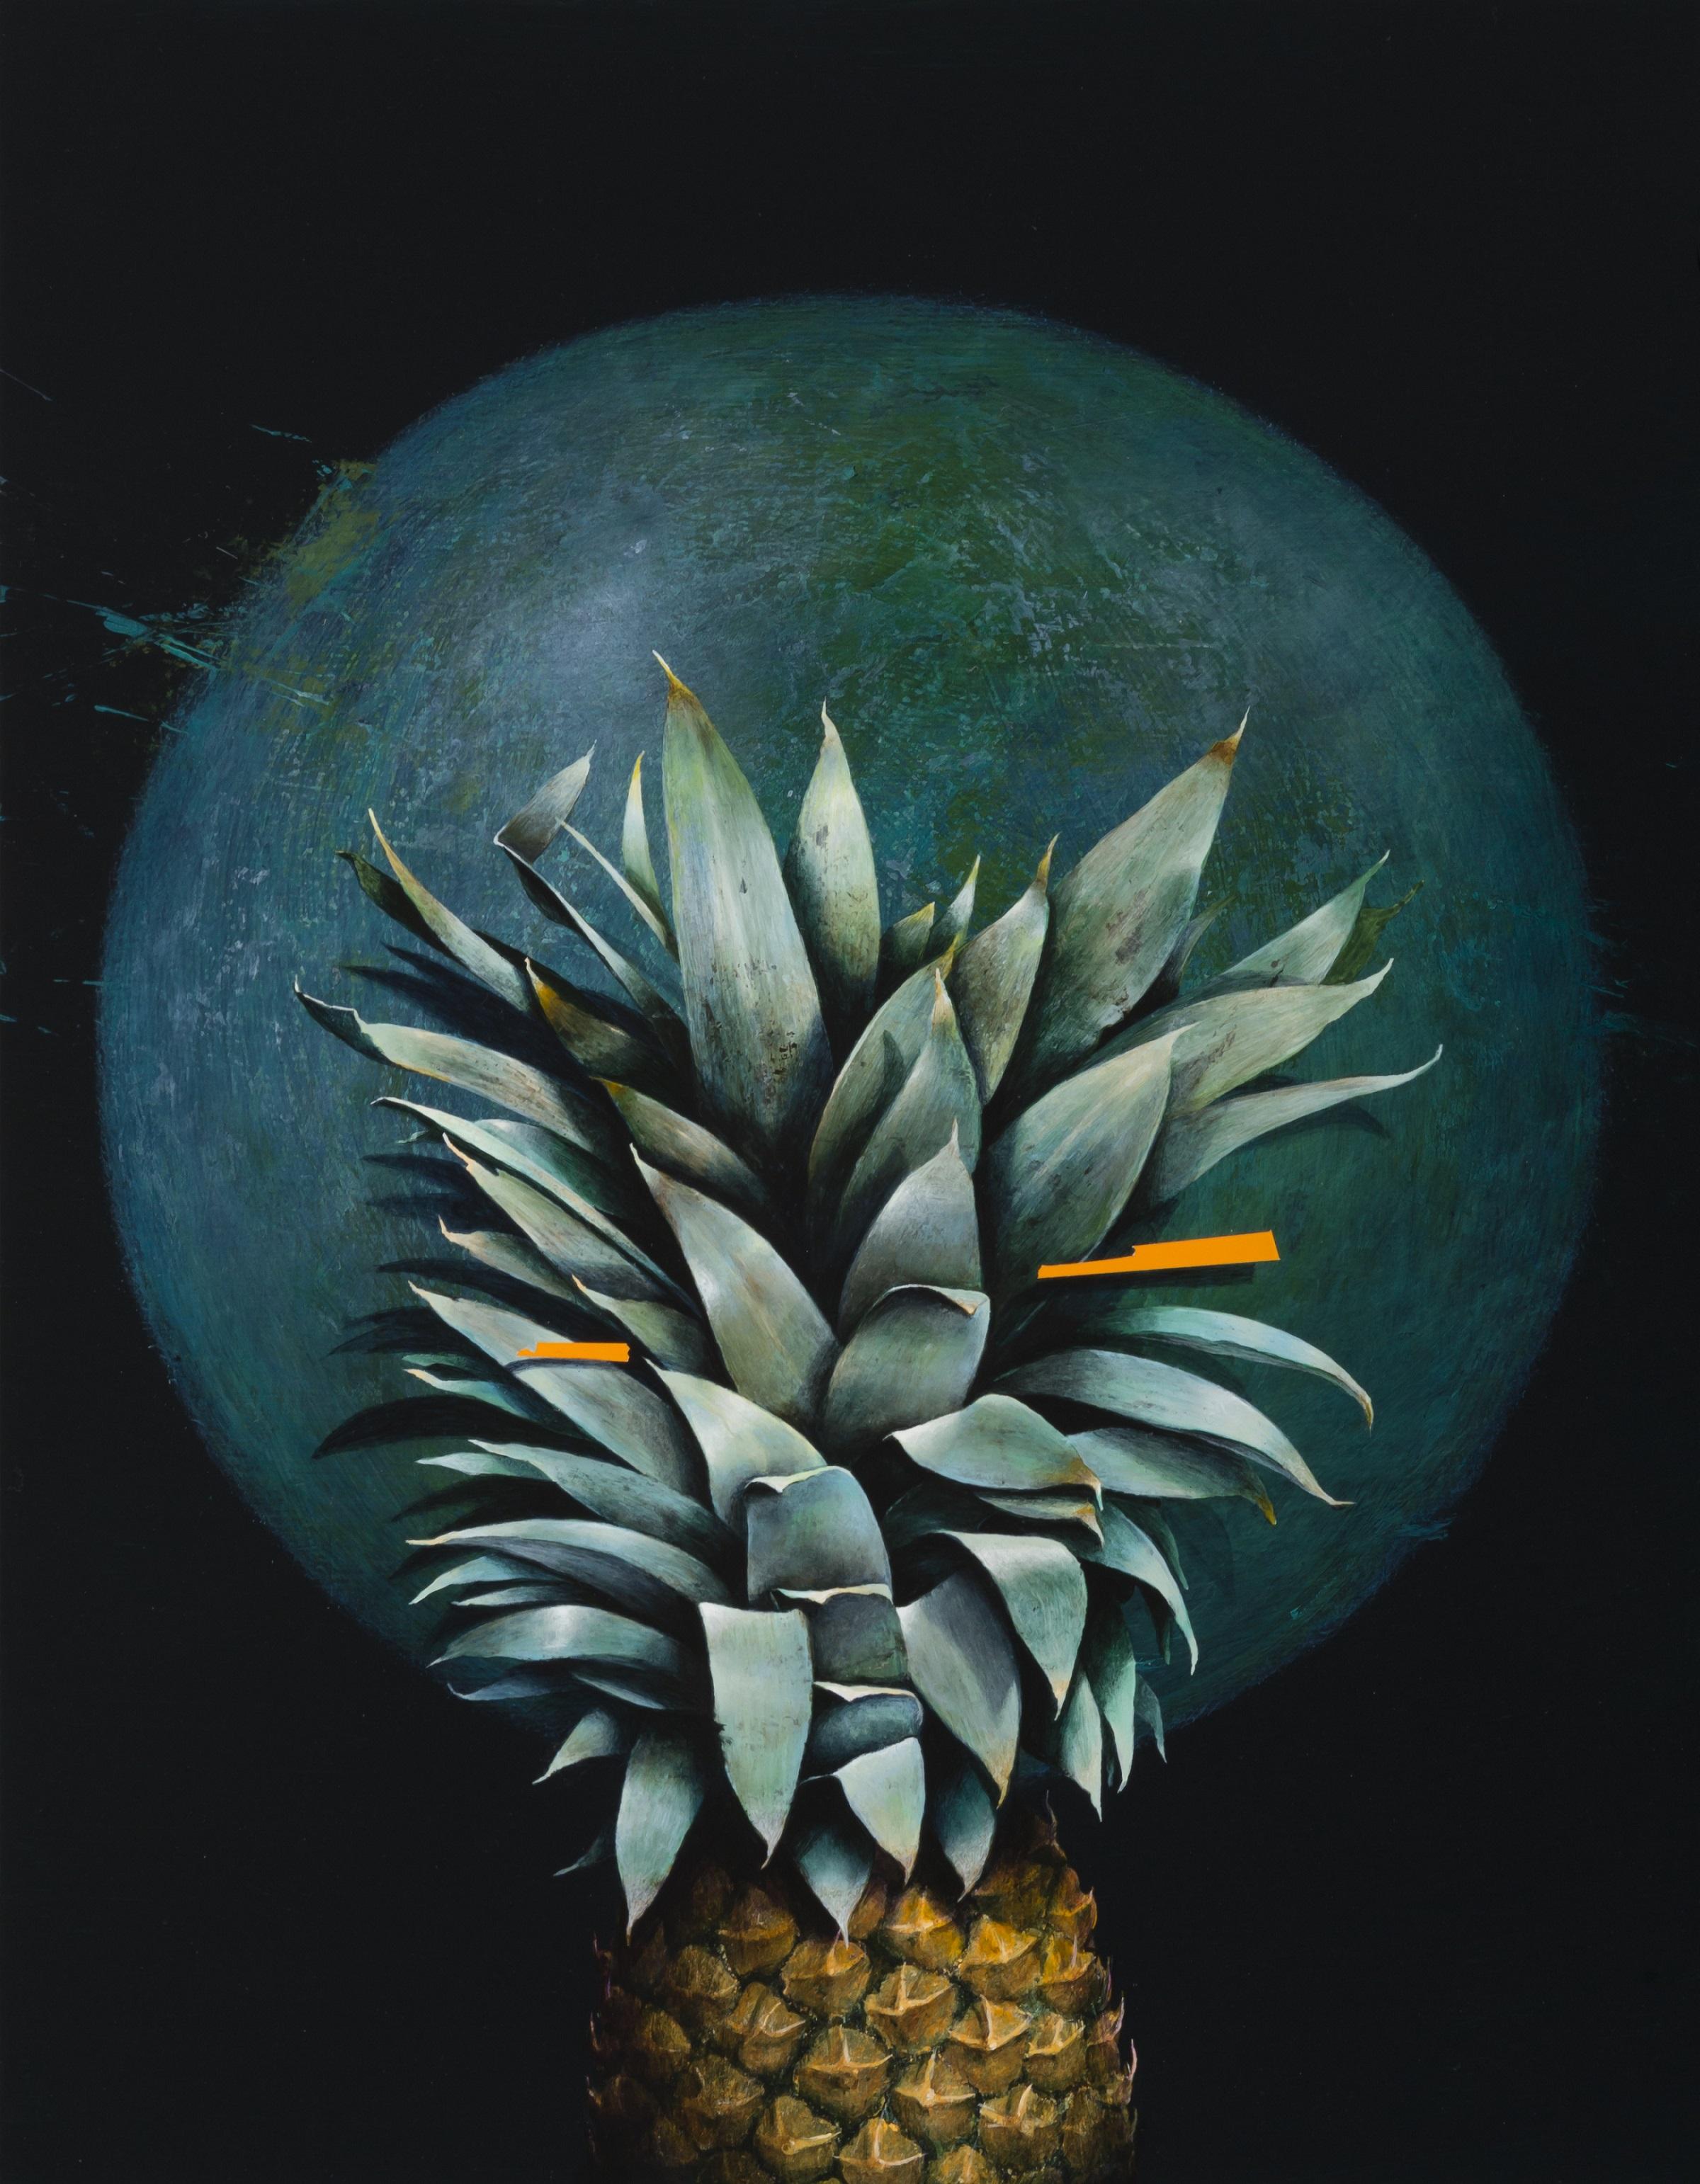 Jarek Wojcik, Spaces and Things 04 , 2015, acrylic on clayboard, 45 x 35cm